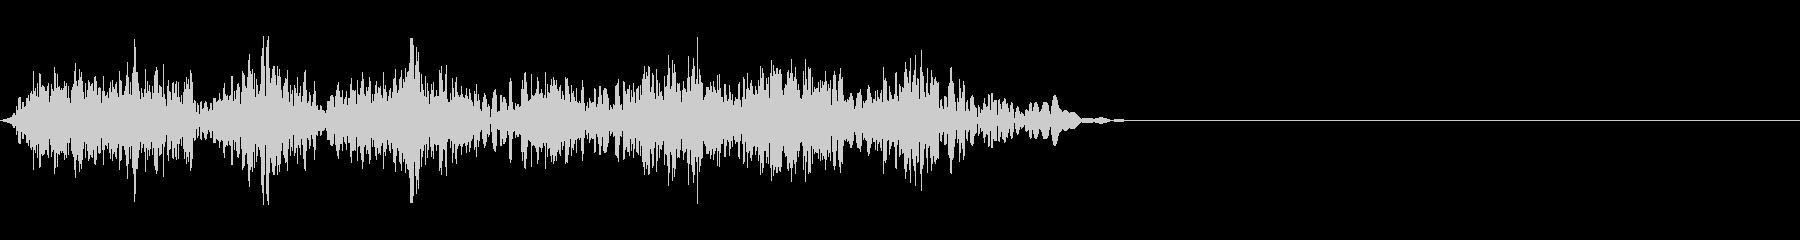 DJスクラッチ10_ワンショット05の未再生の波形